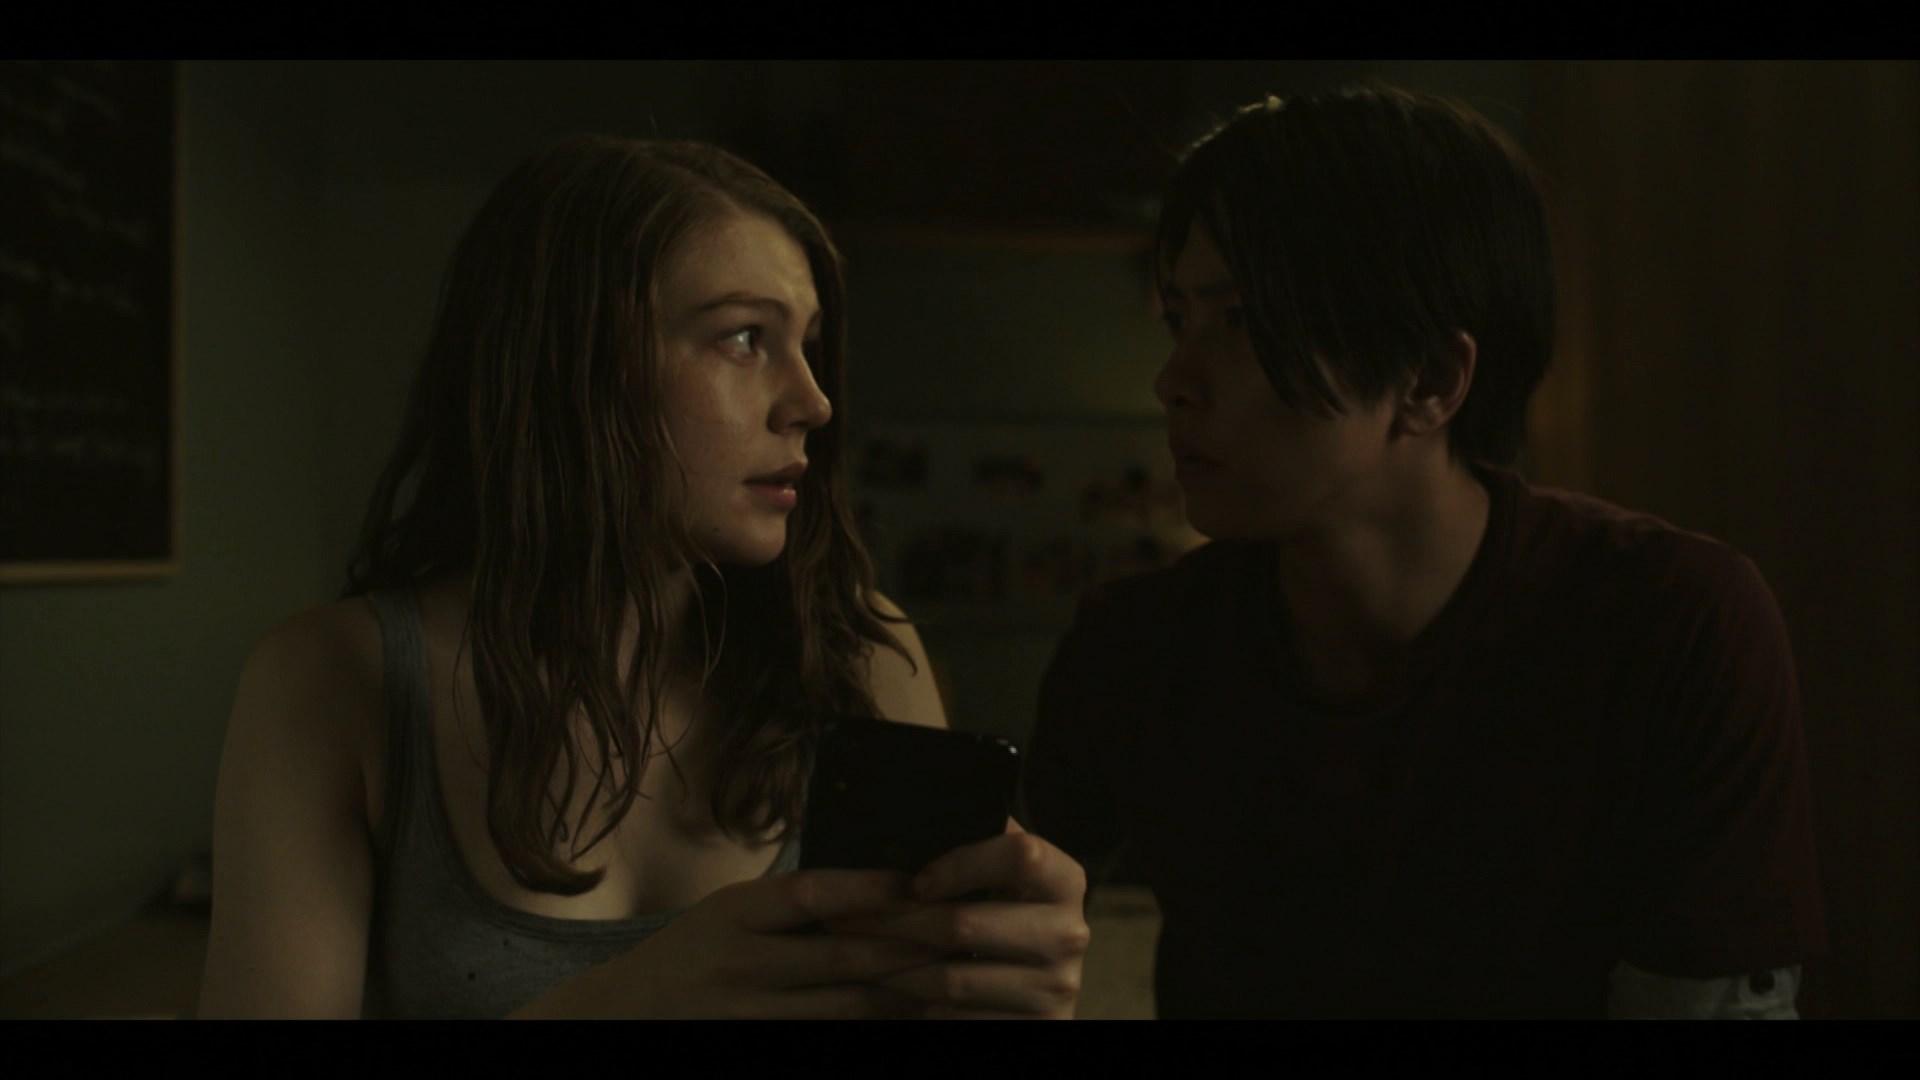 The Head Temporada 1 (2020) 1080p WEB-DL Latino